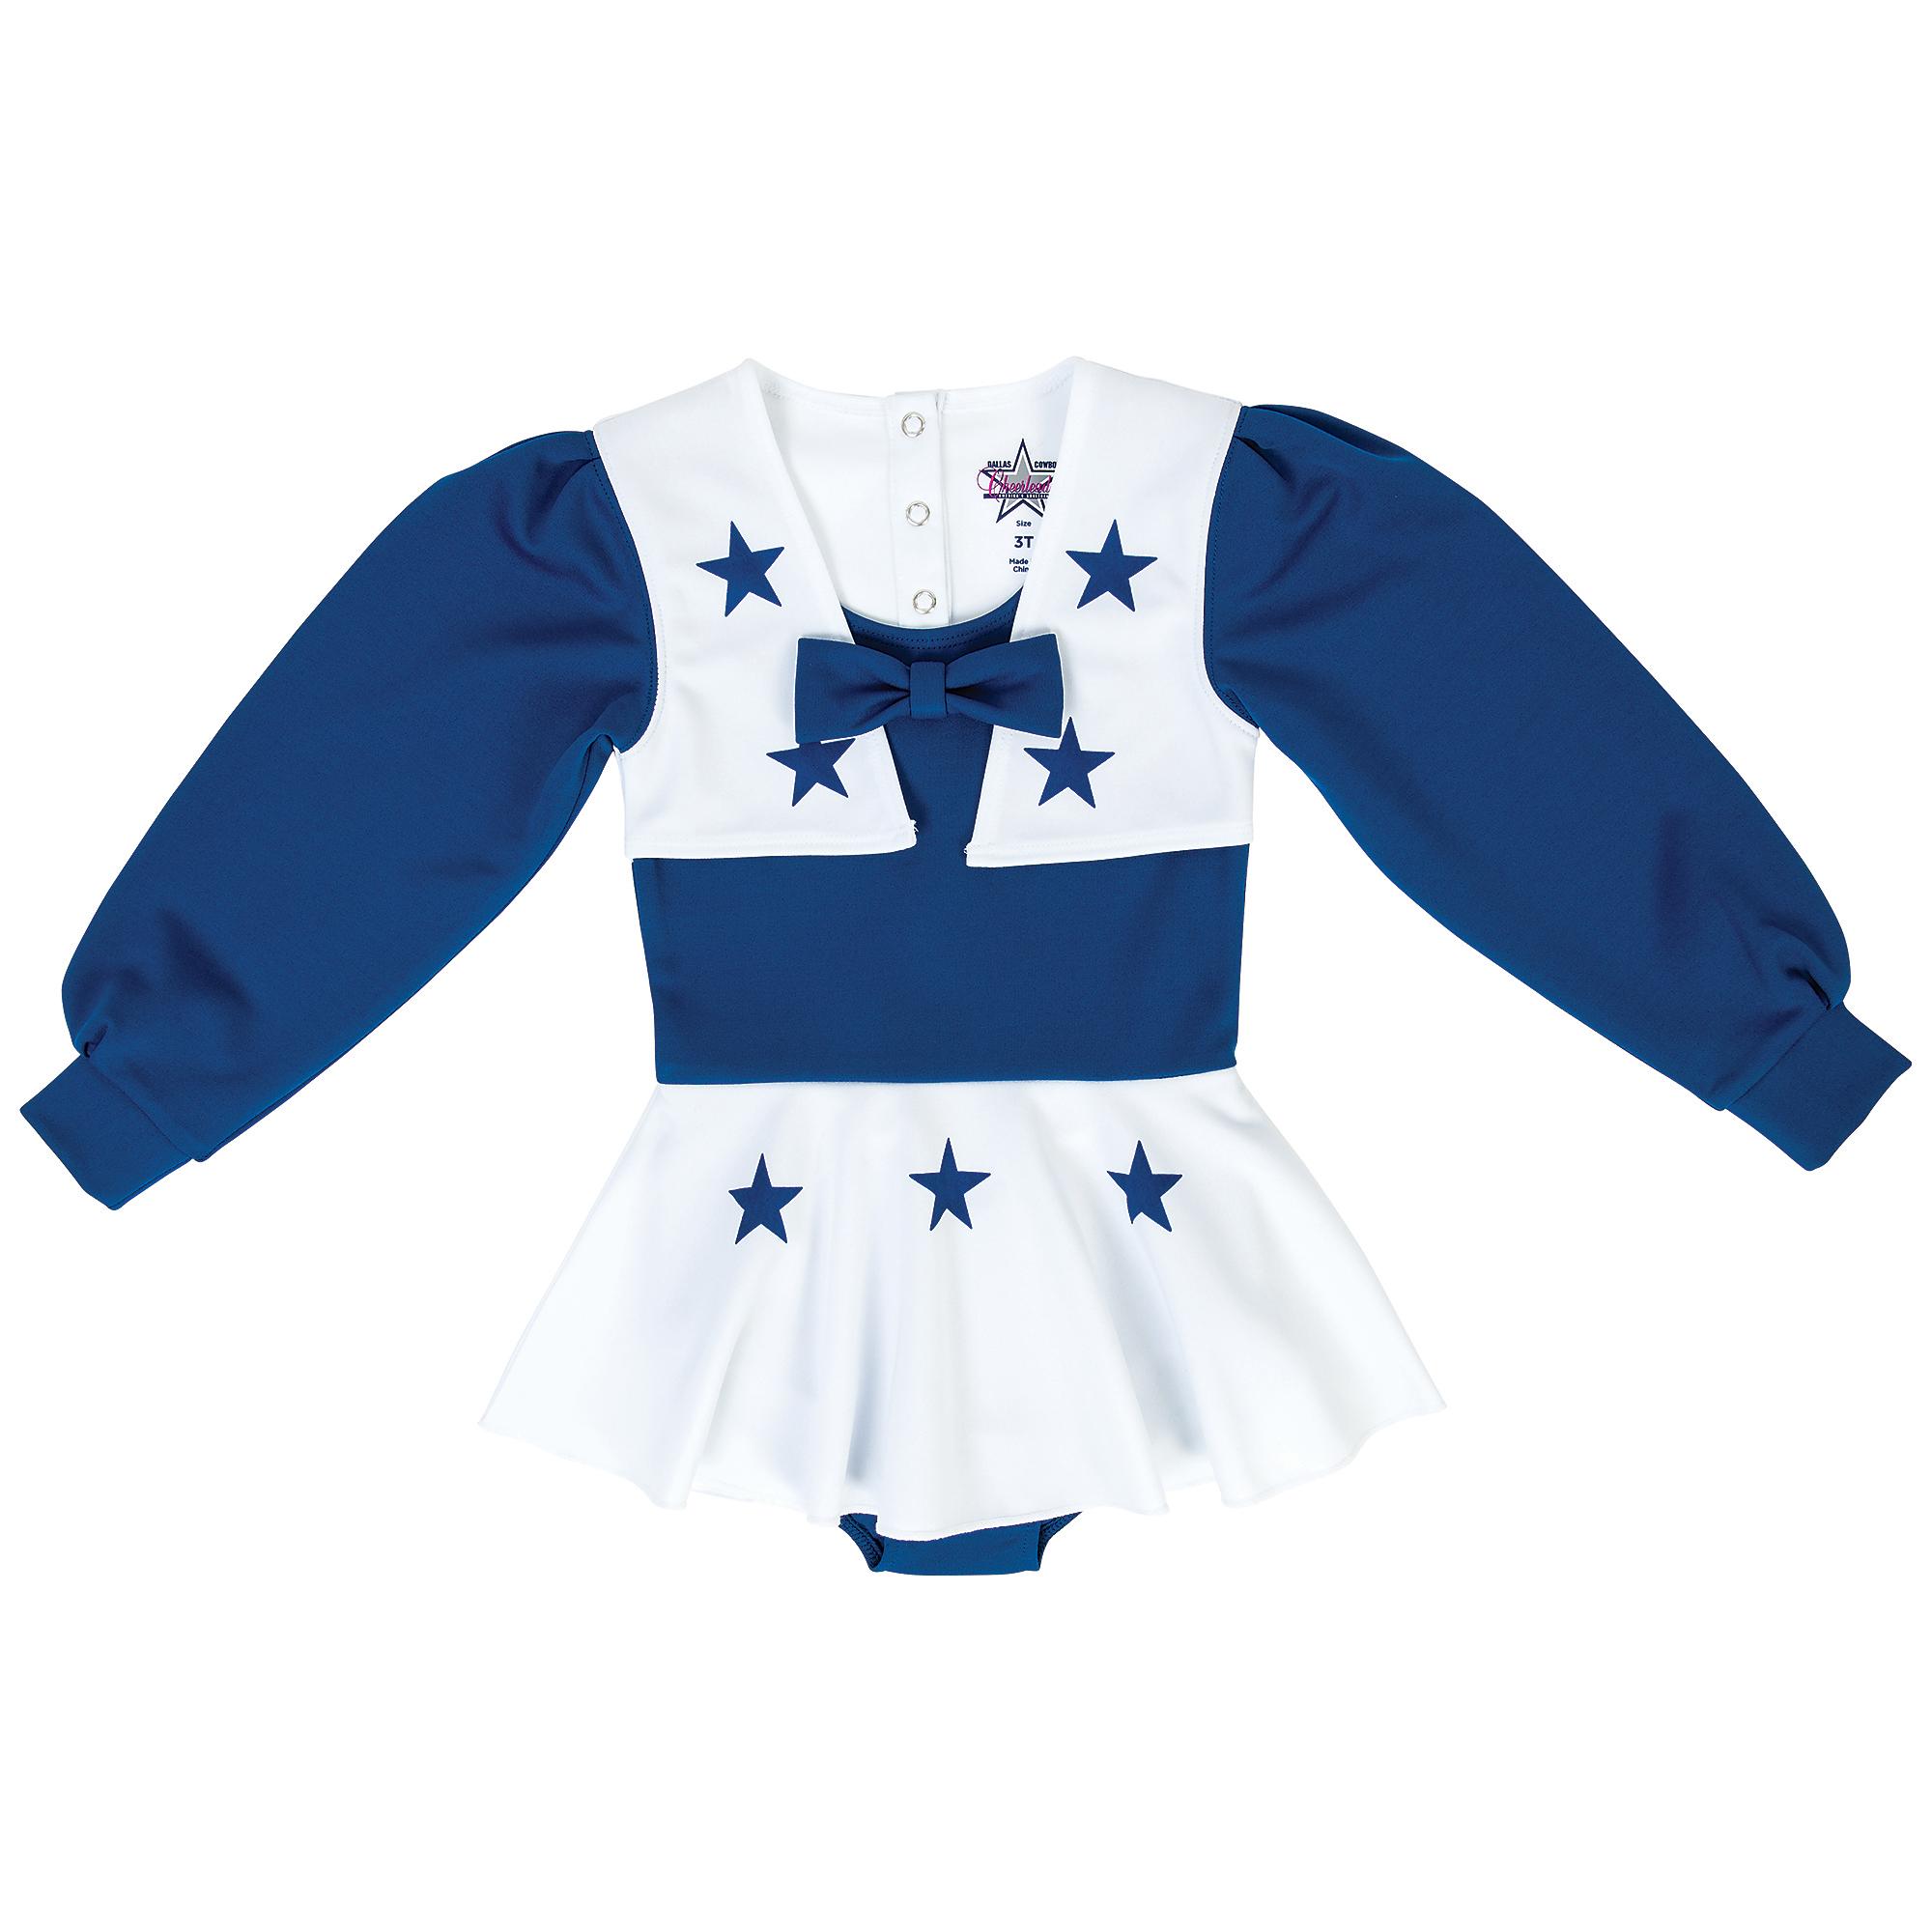 Dallas Cowboys Cheerleader Girls Cheer Set